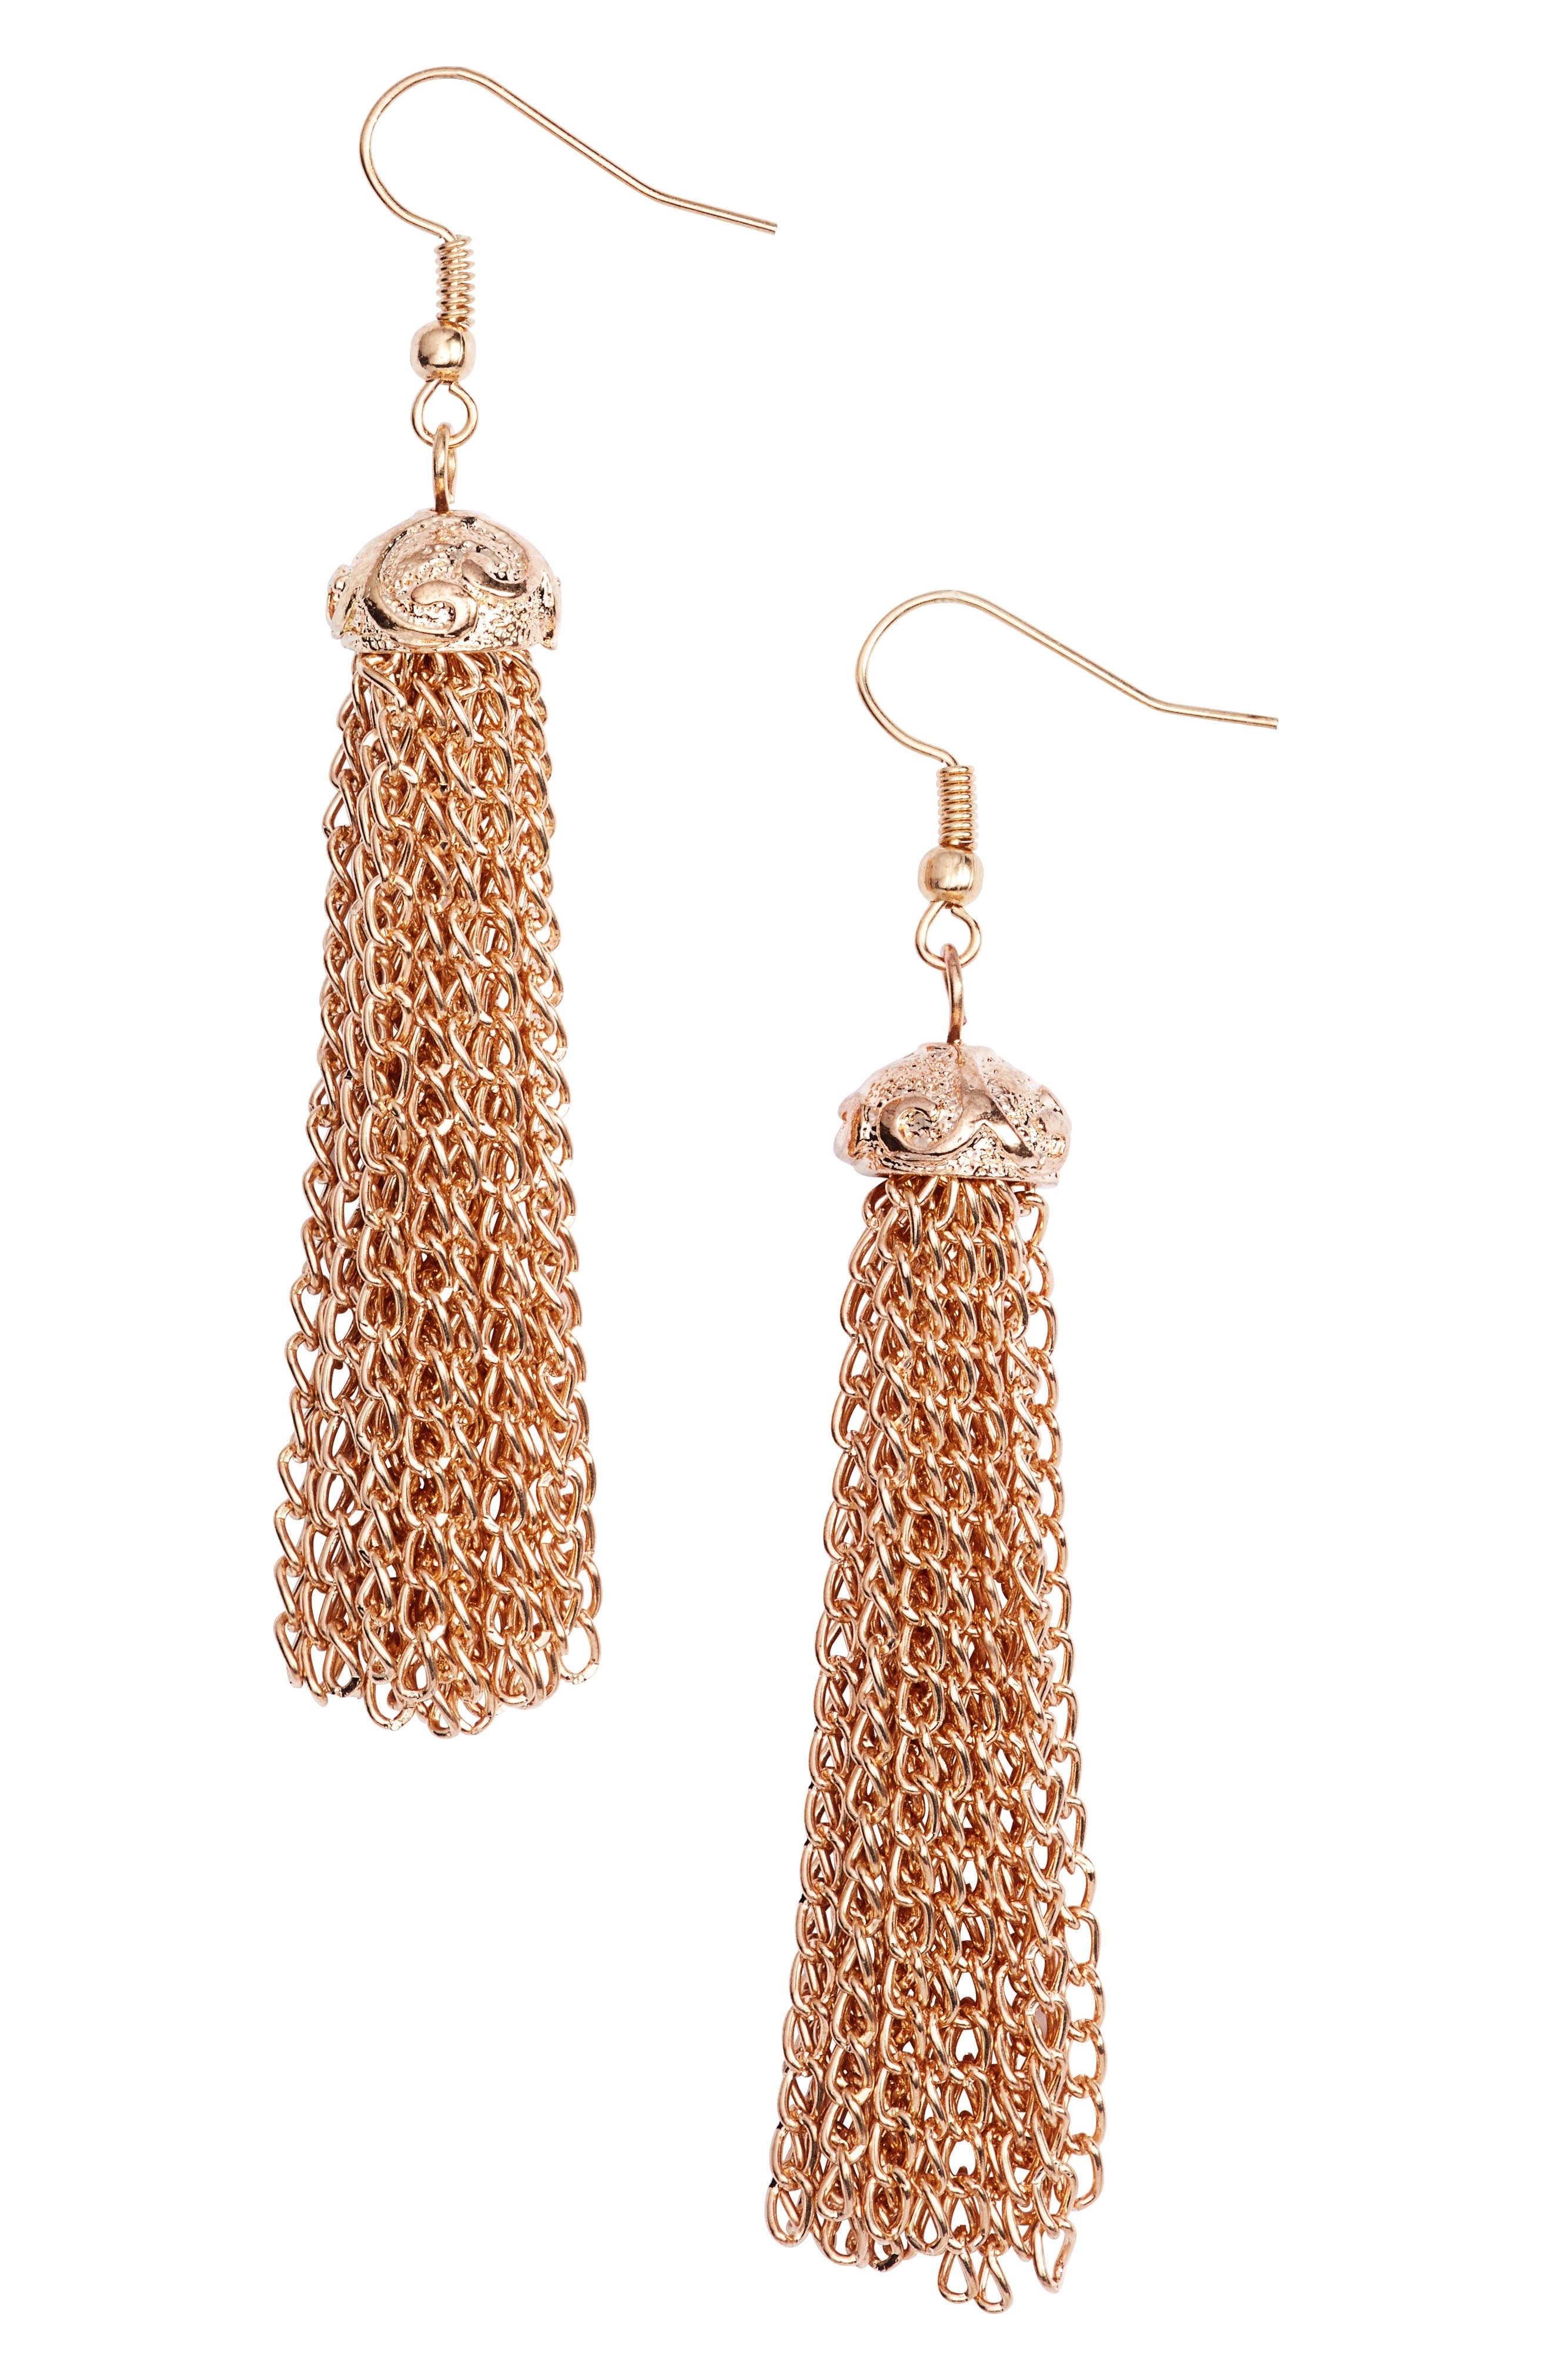 Elise M. Fortuna Chain Tassel Earrings